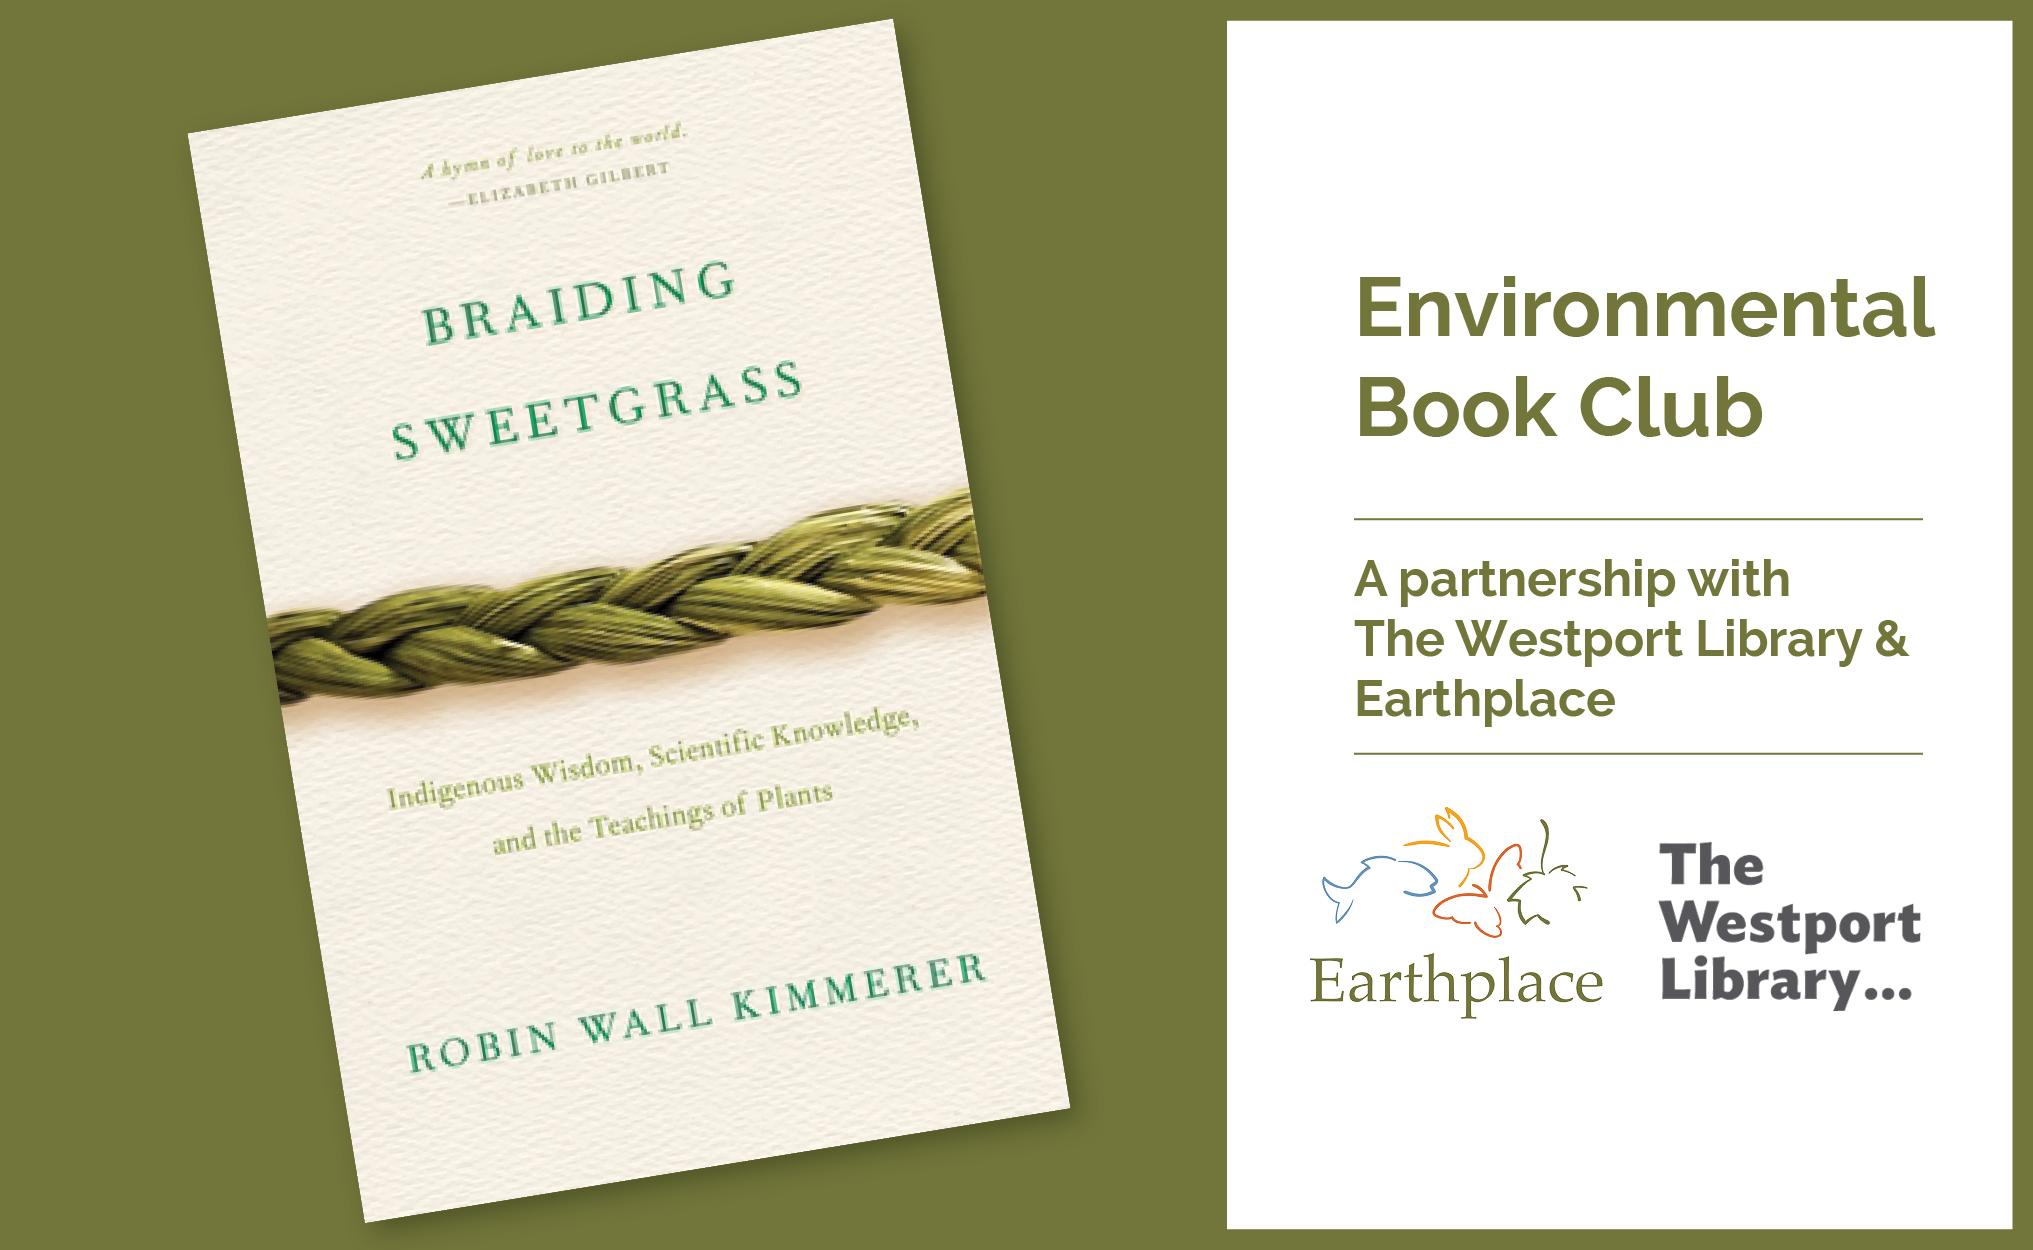 Environmental Book Club - Braiding Sweetgrass